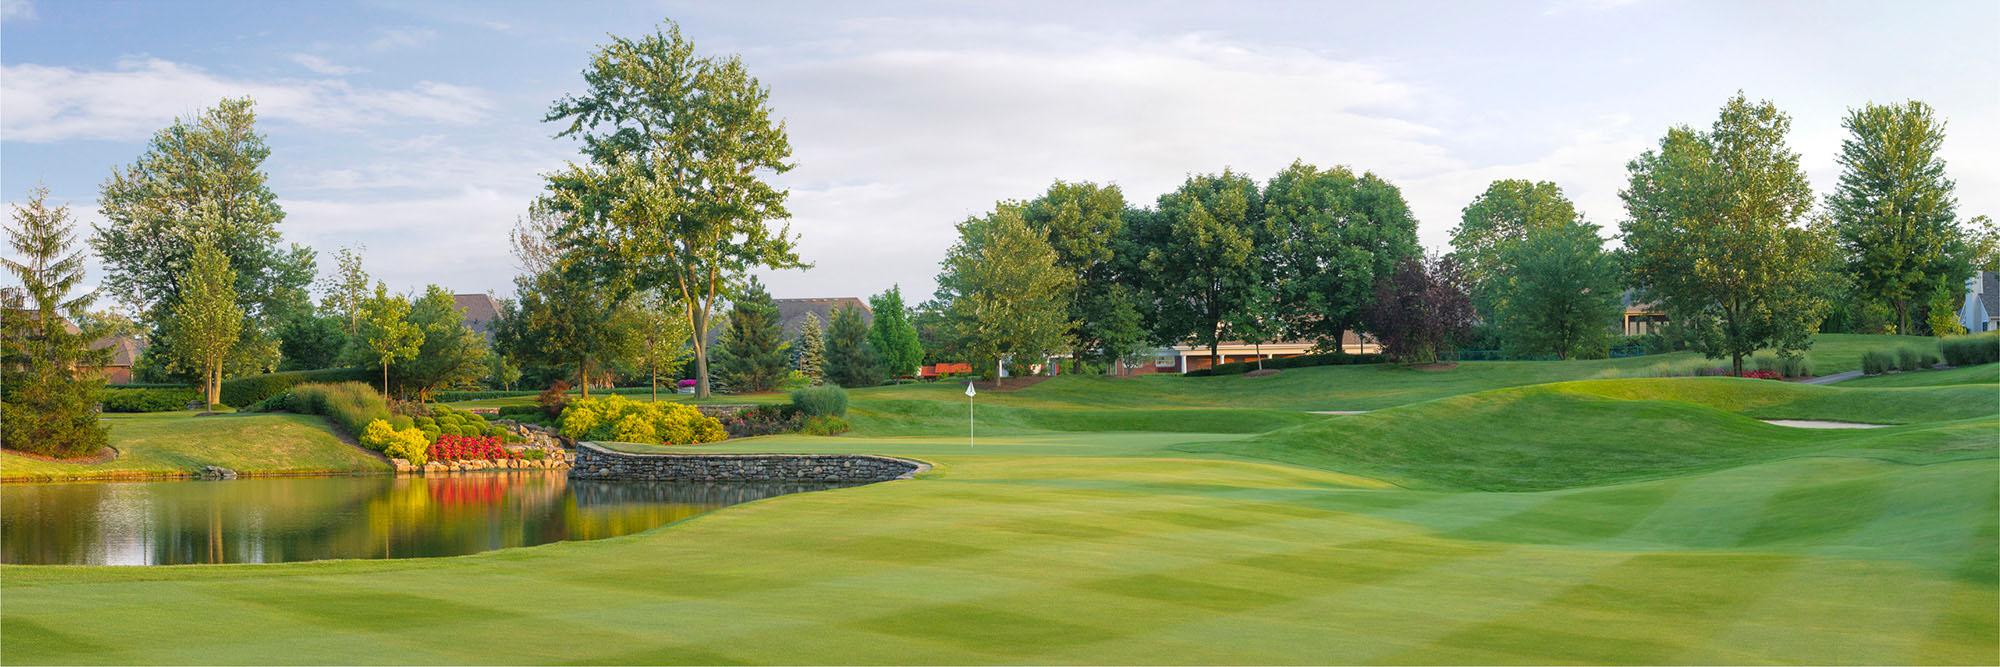 Golf Course Image - Heritage Club No. 18